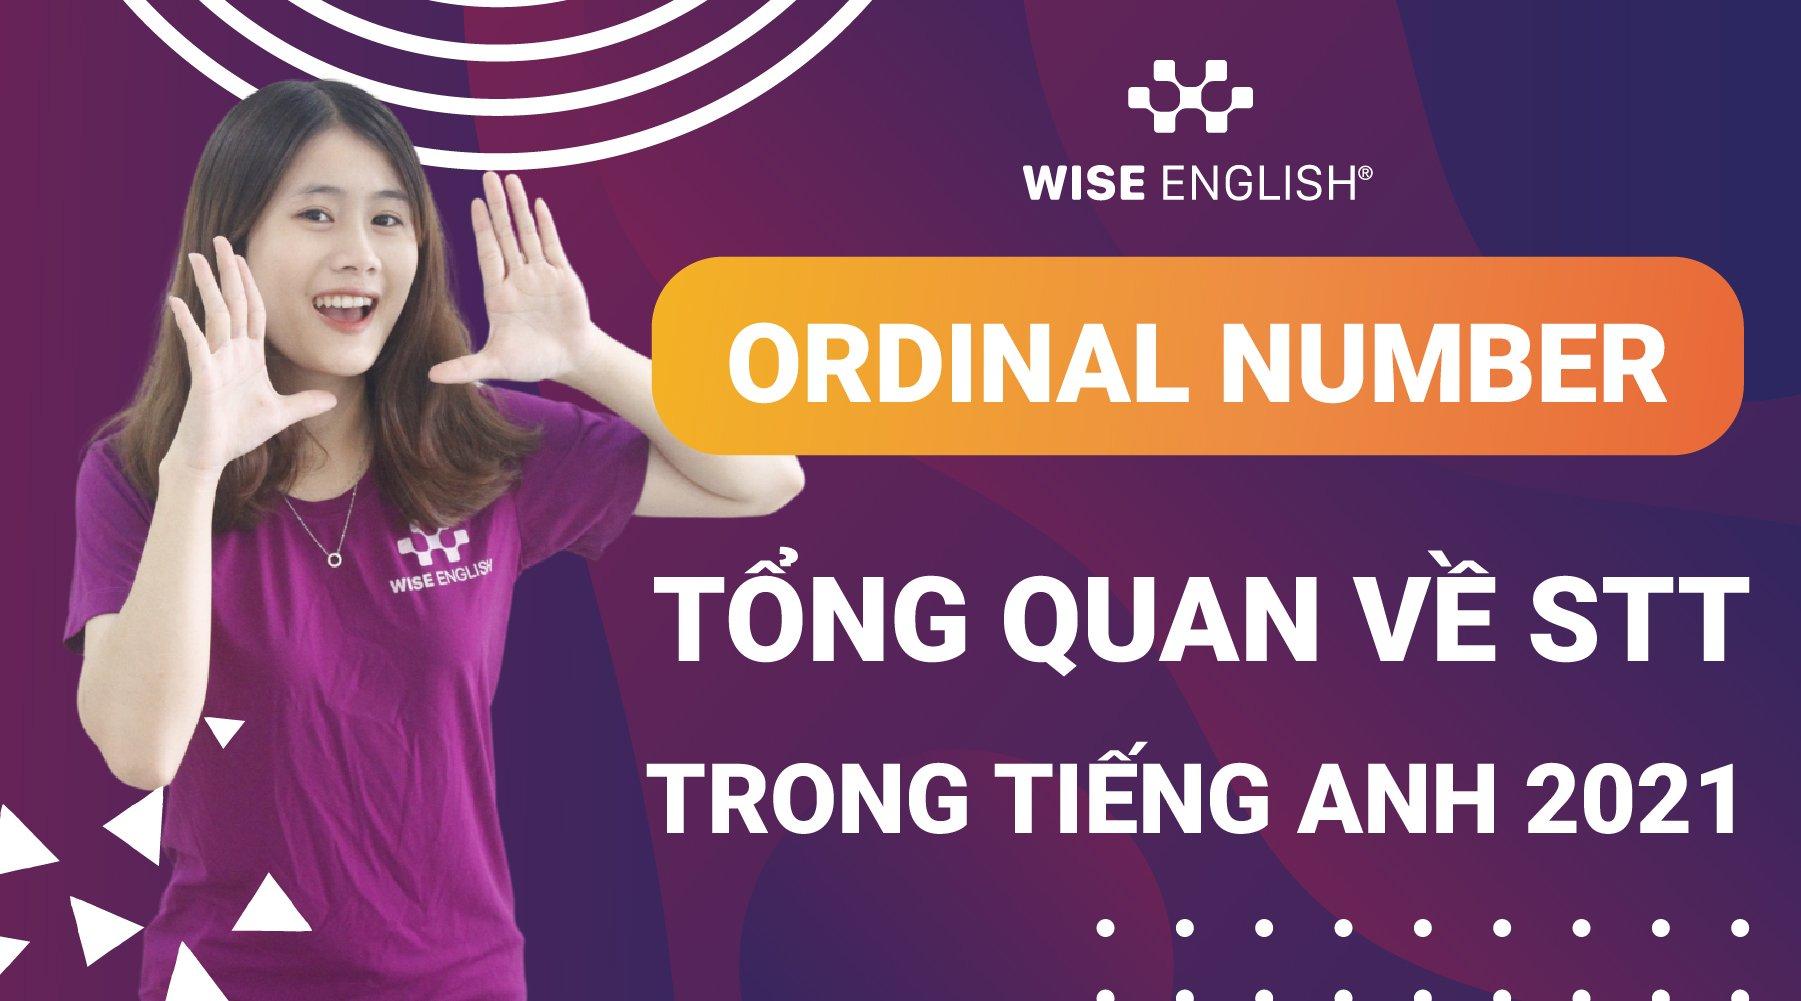 ordinal number